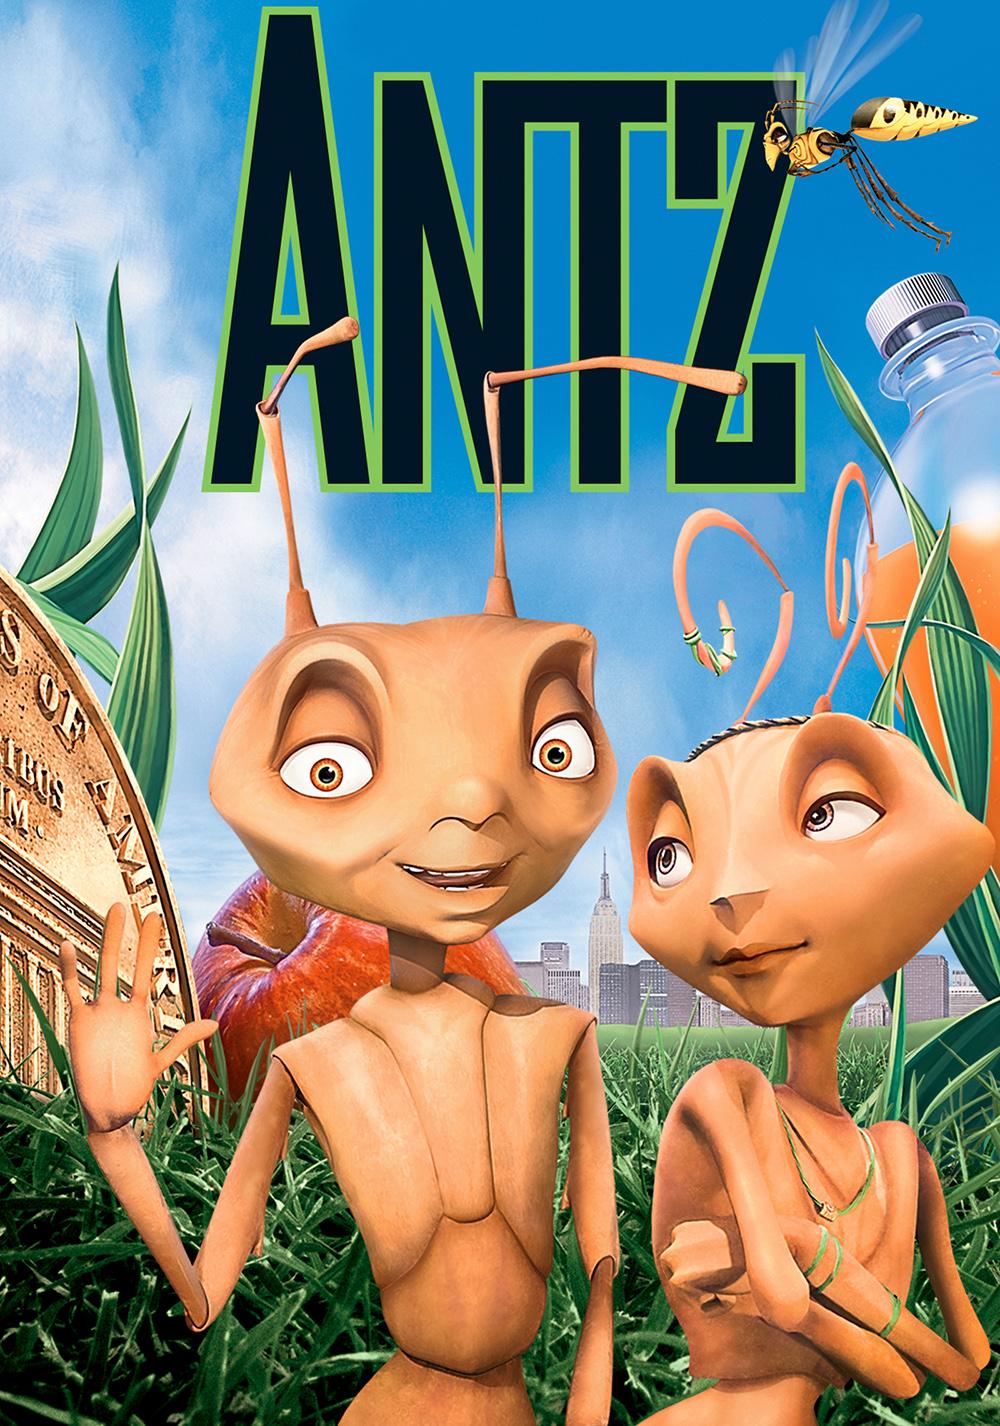 Antz เปิดโลกใบใหญ่ของนายมด [HD][พากย์ไทย]